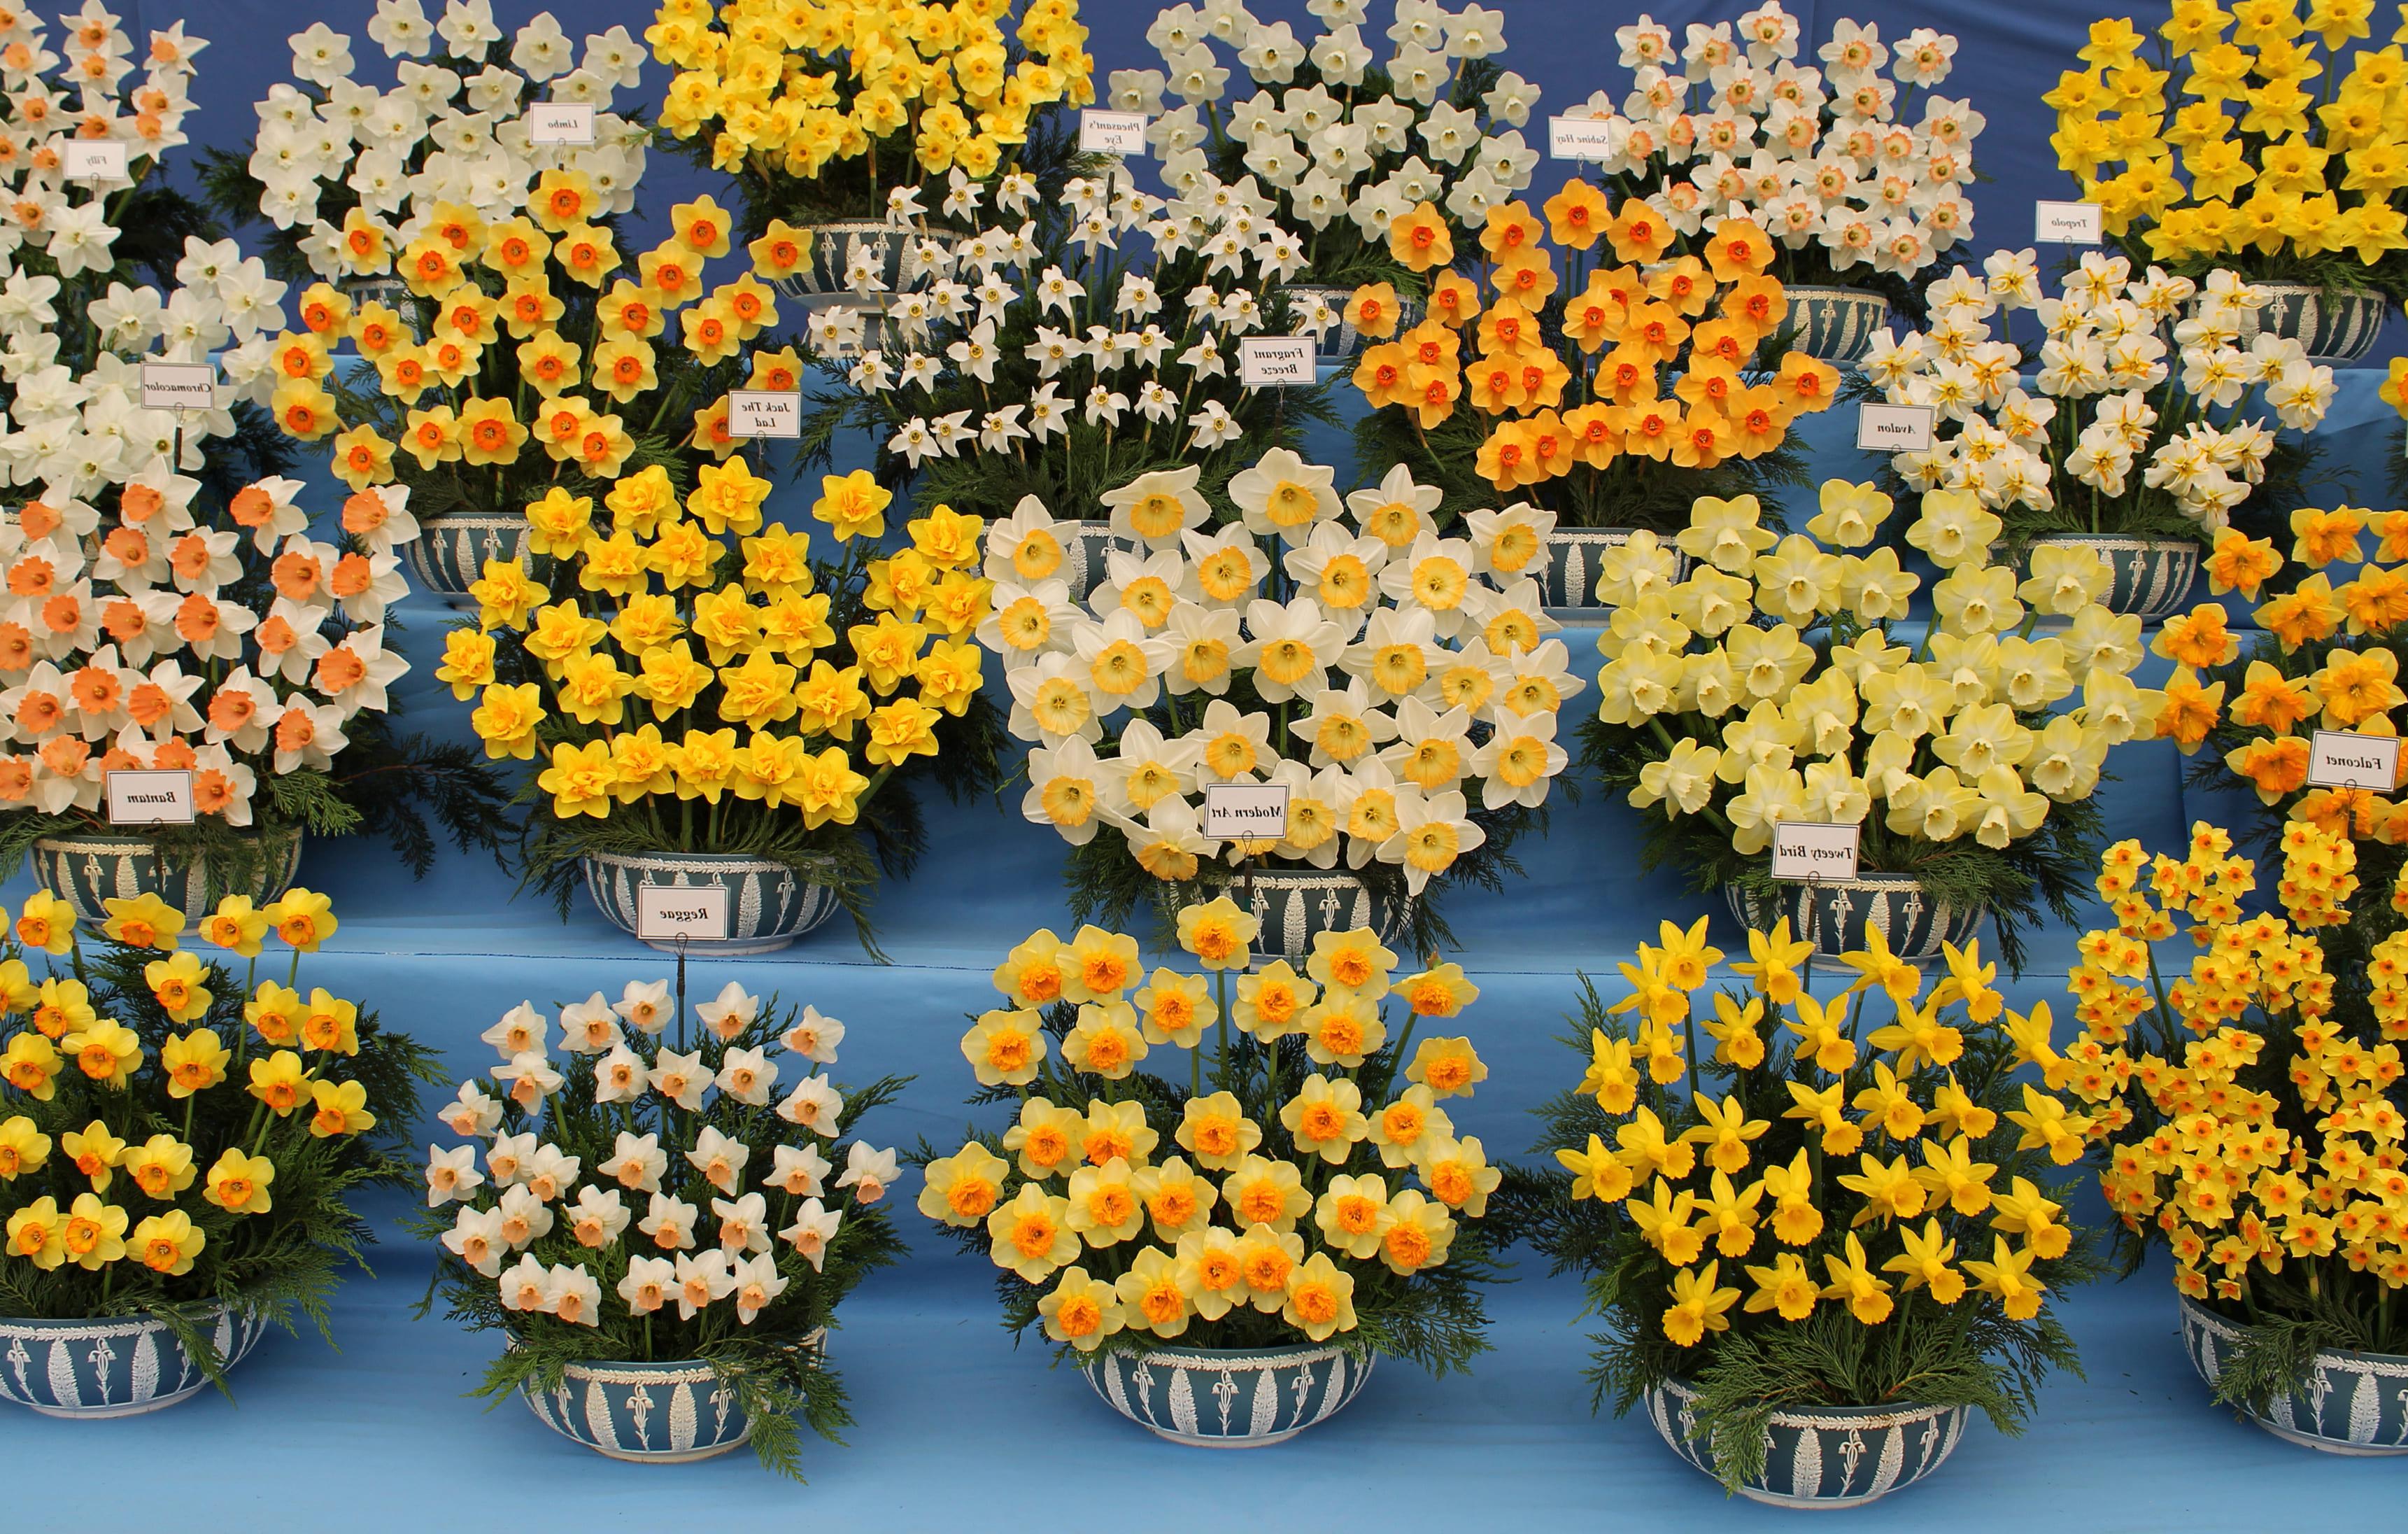 daffodils-photo-63